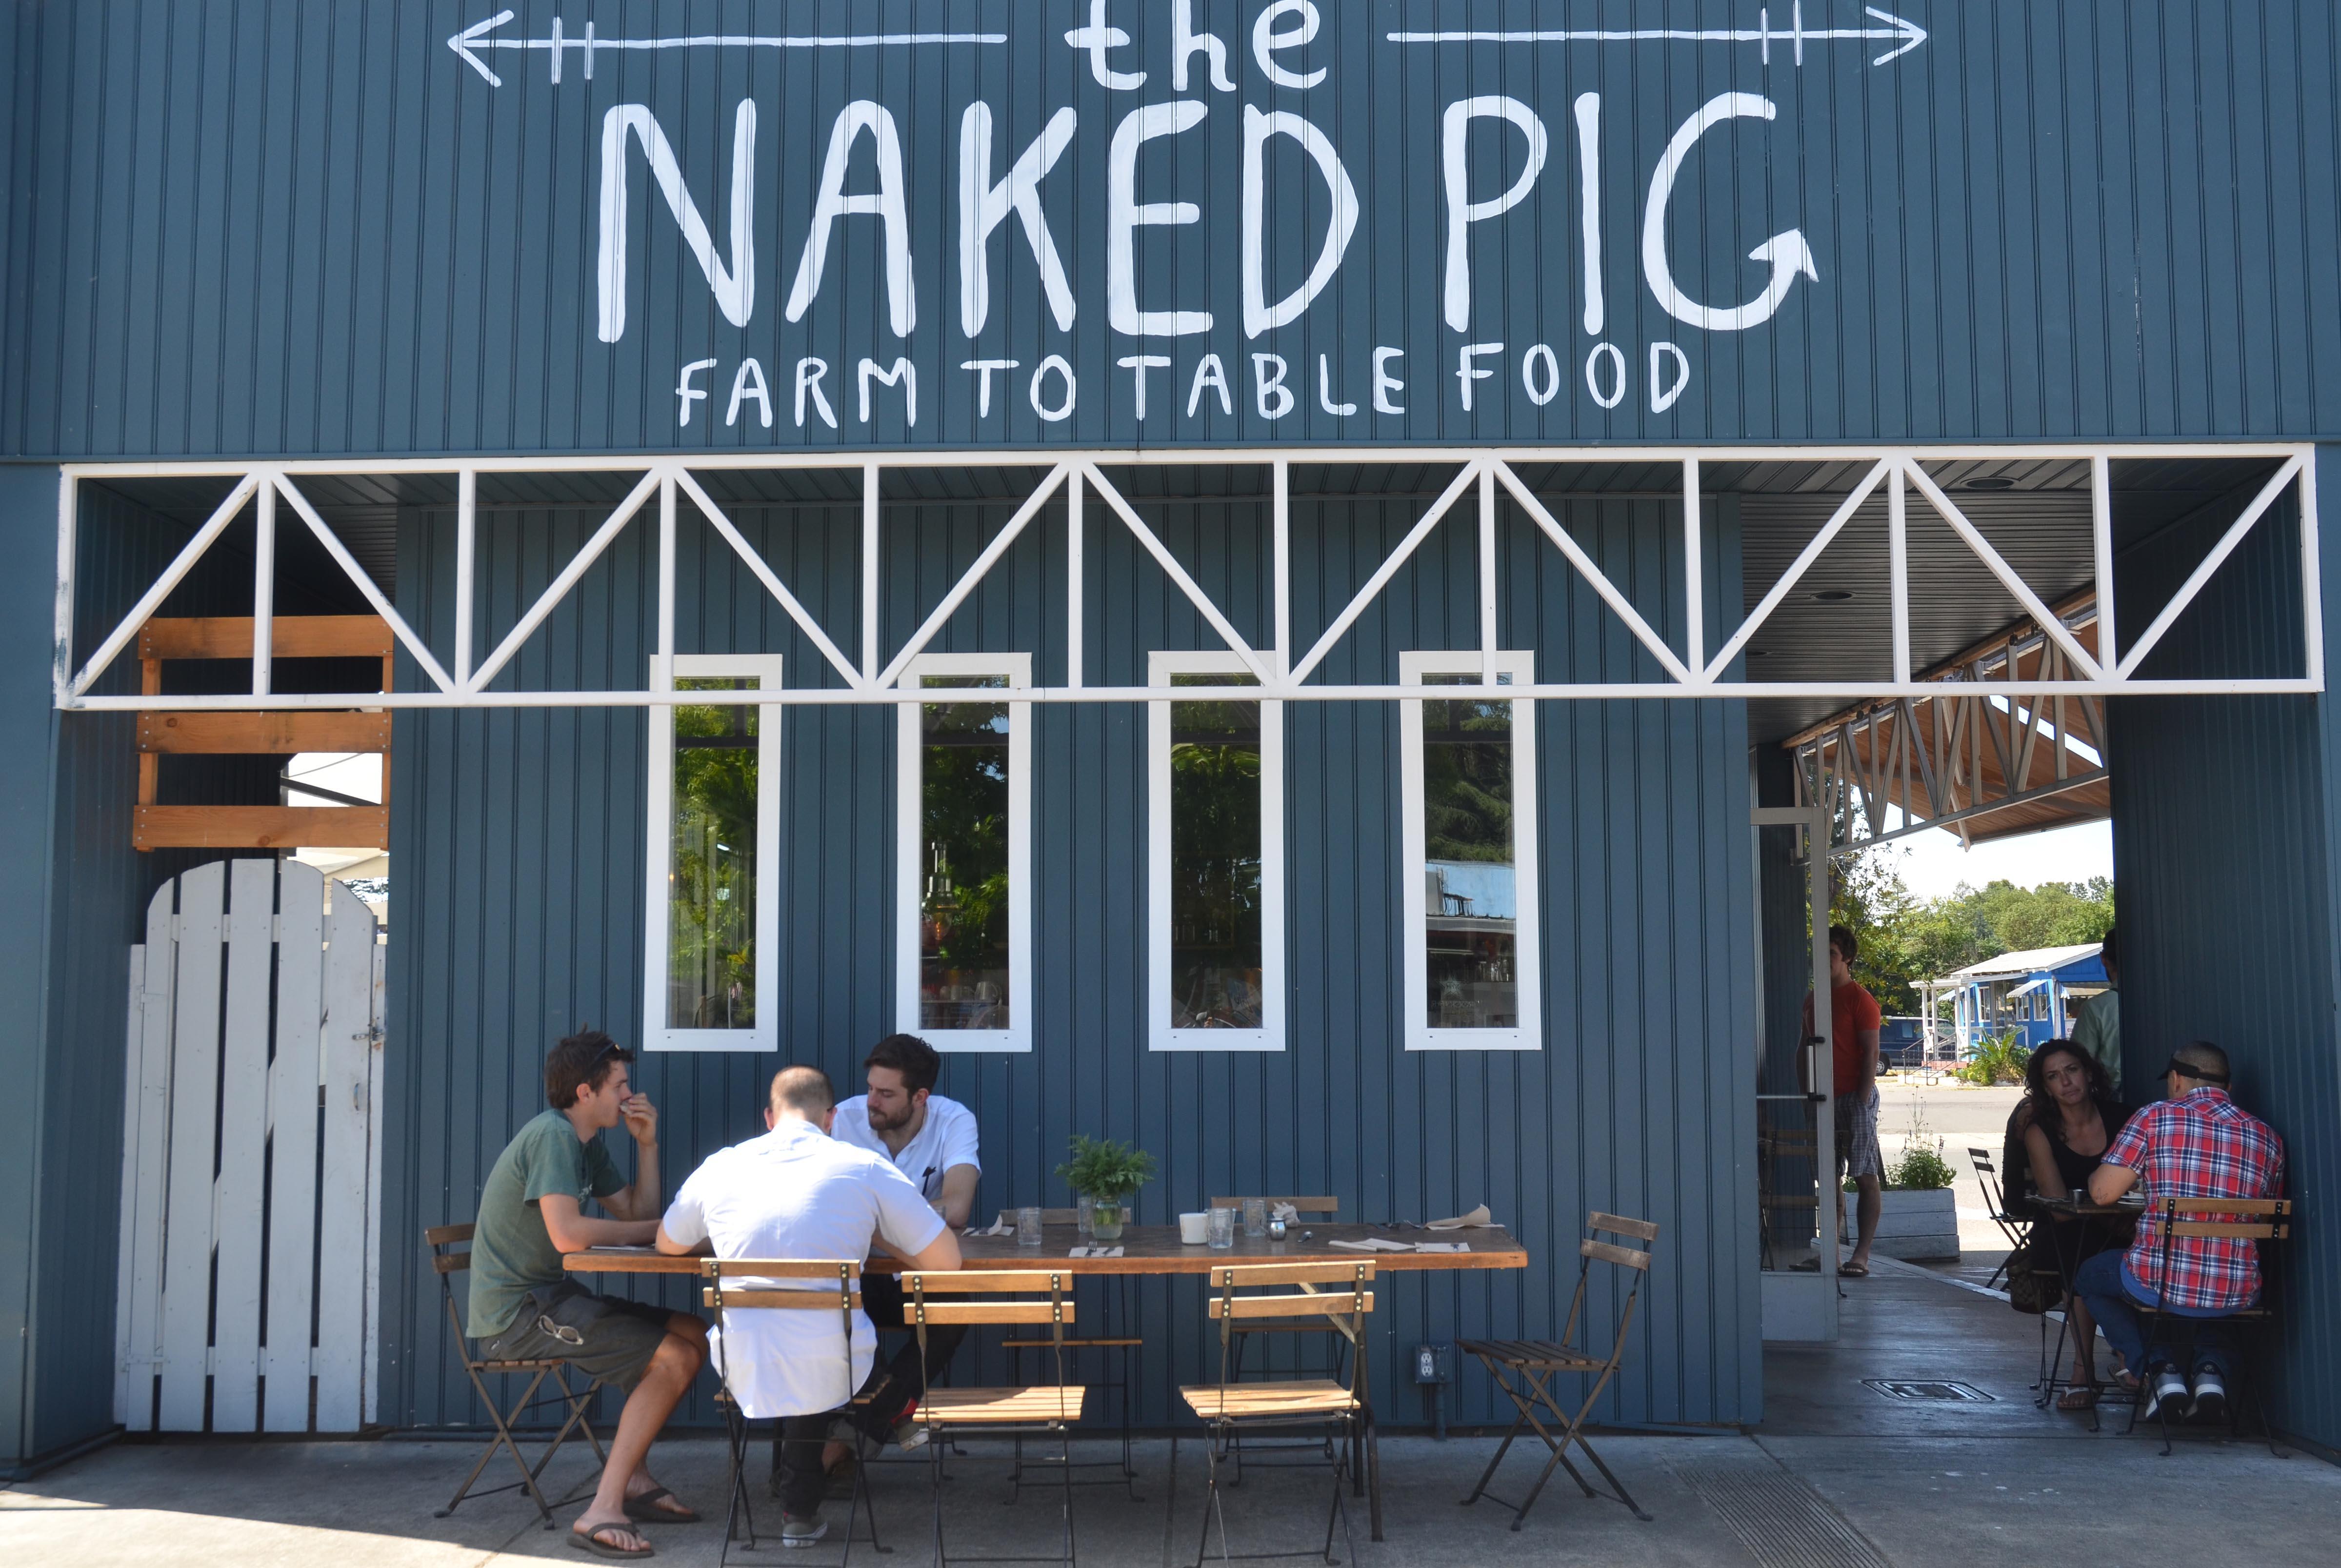 The Naked Pig, Farm To Table Restaurant in Santa Rosa, CA